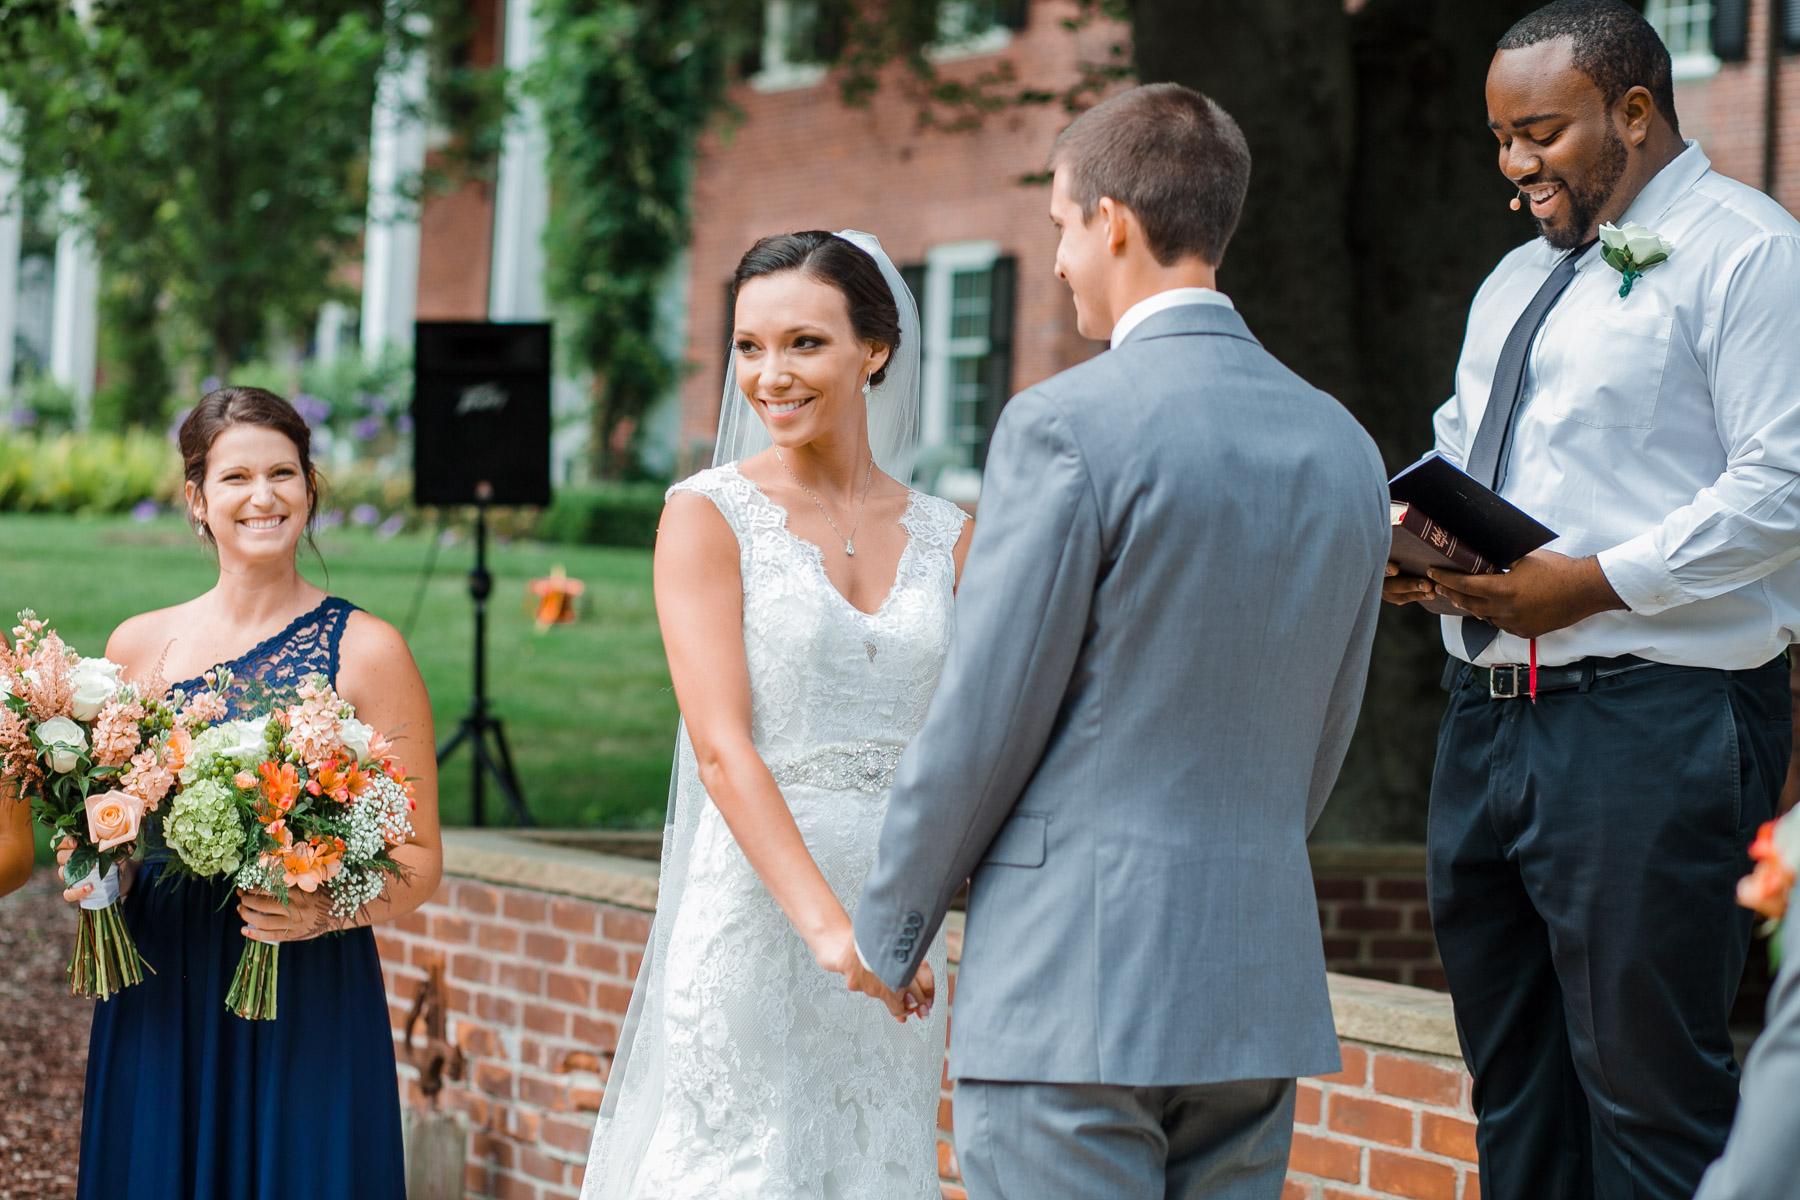 wildwood-park-wedding-photos-41.jpg